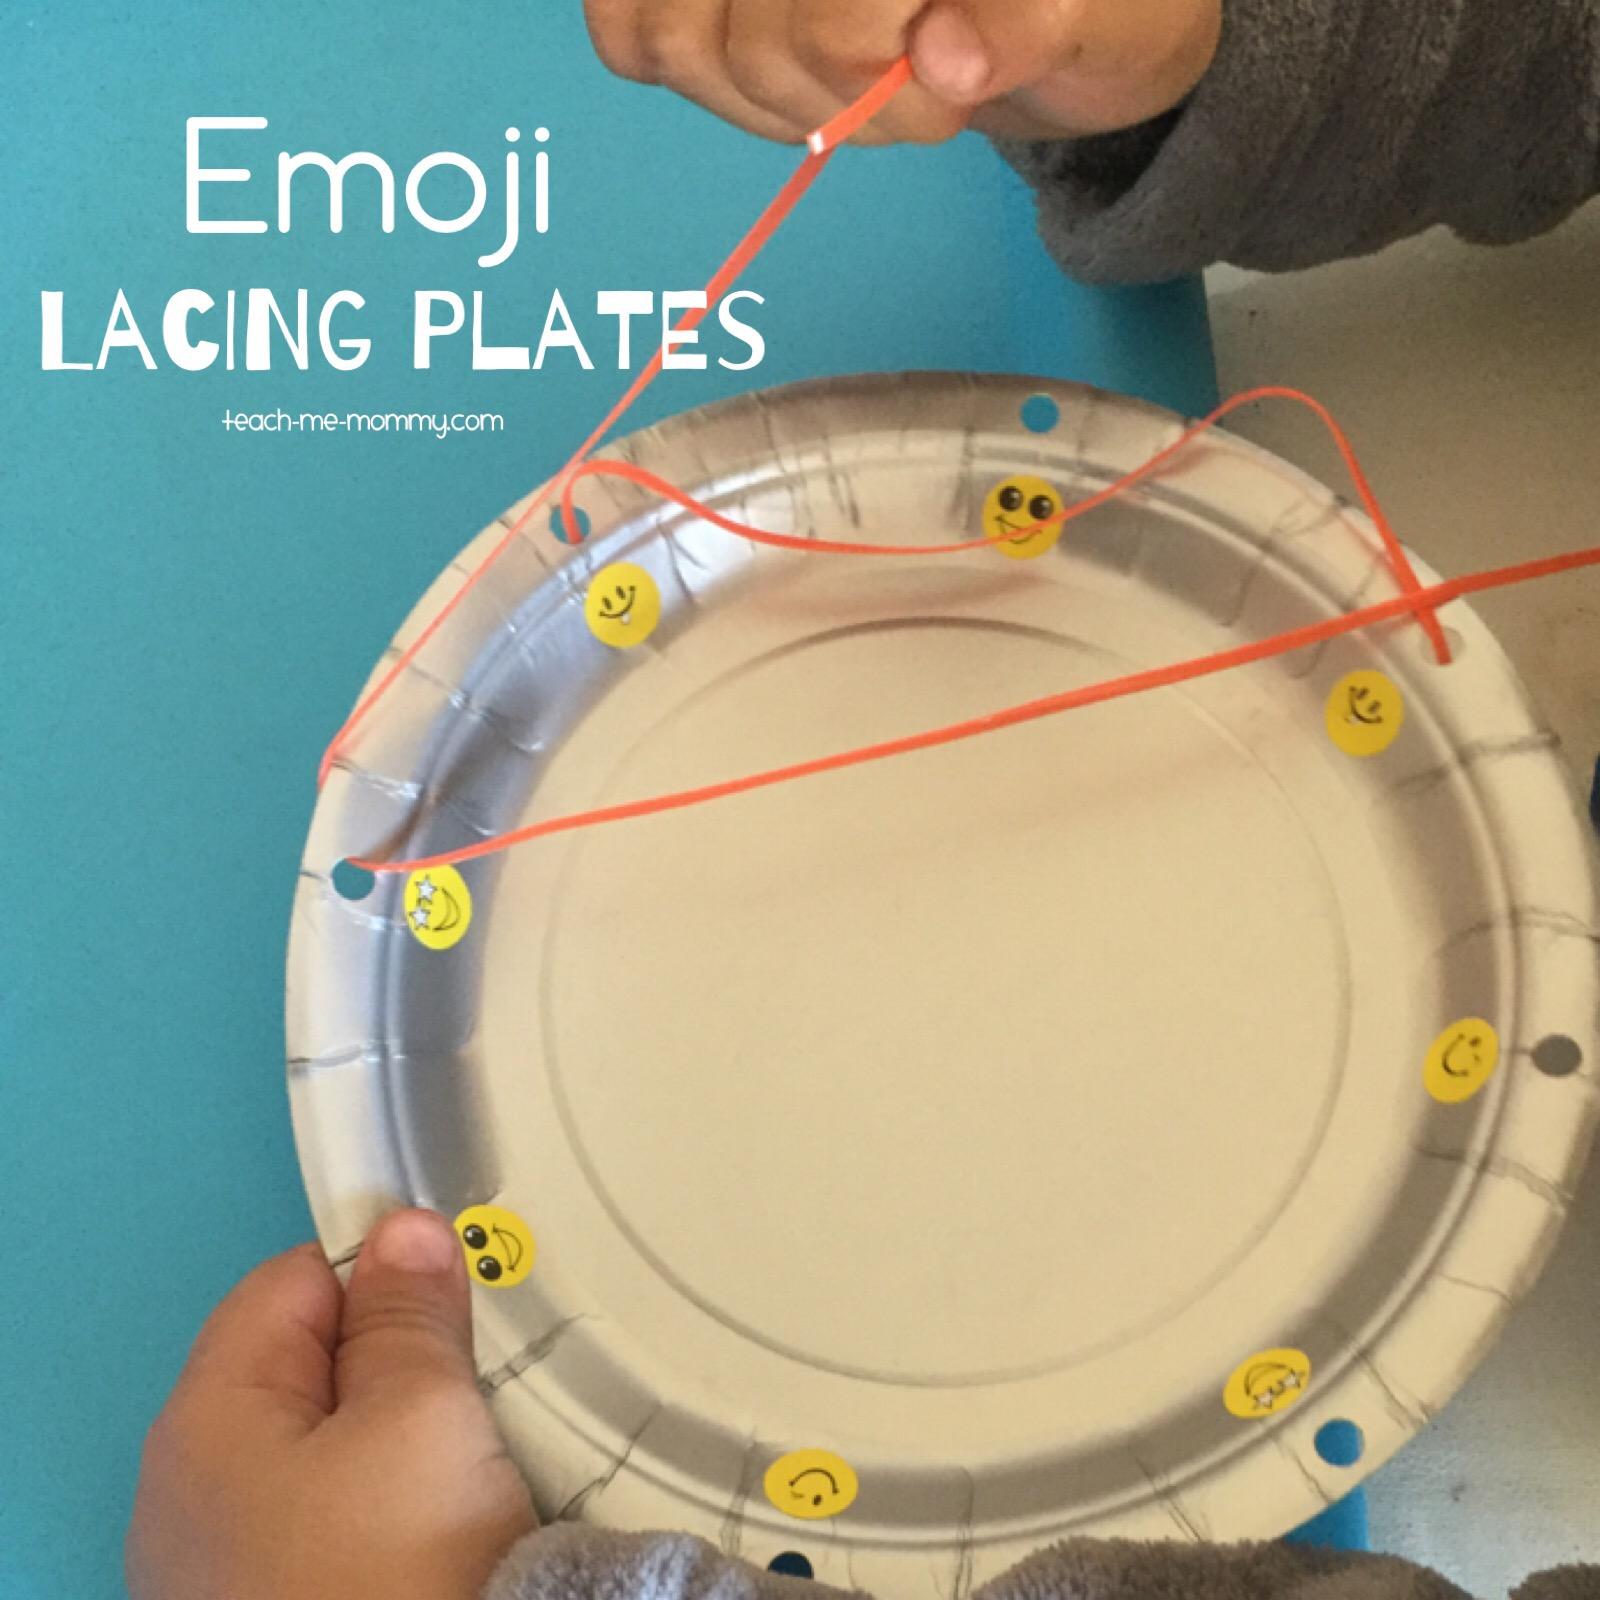 lacing plates